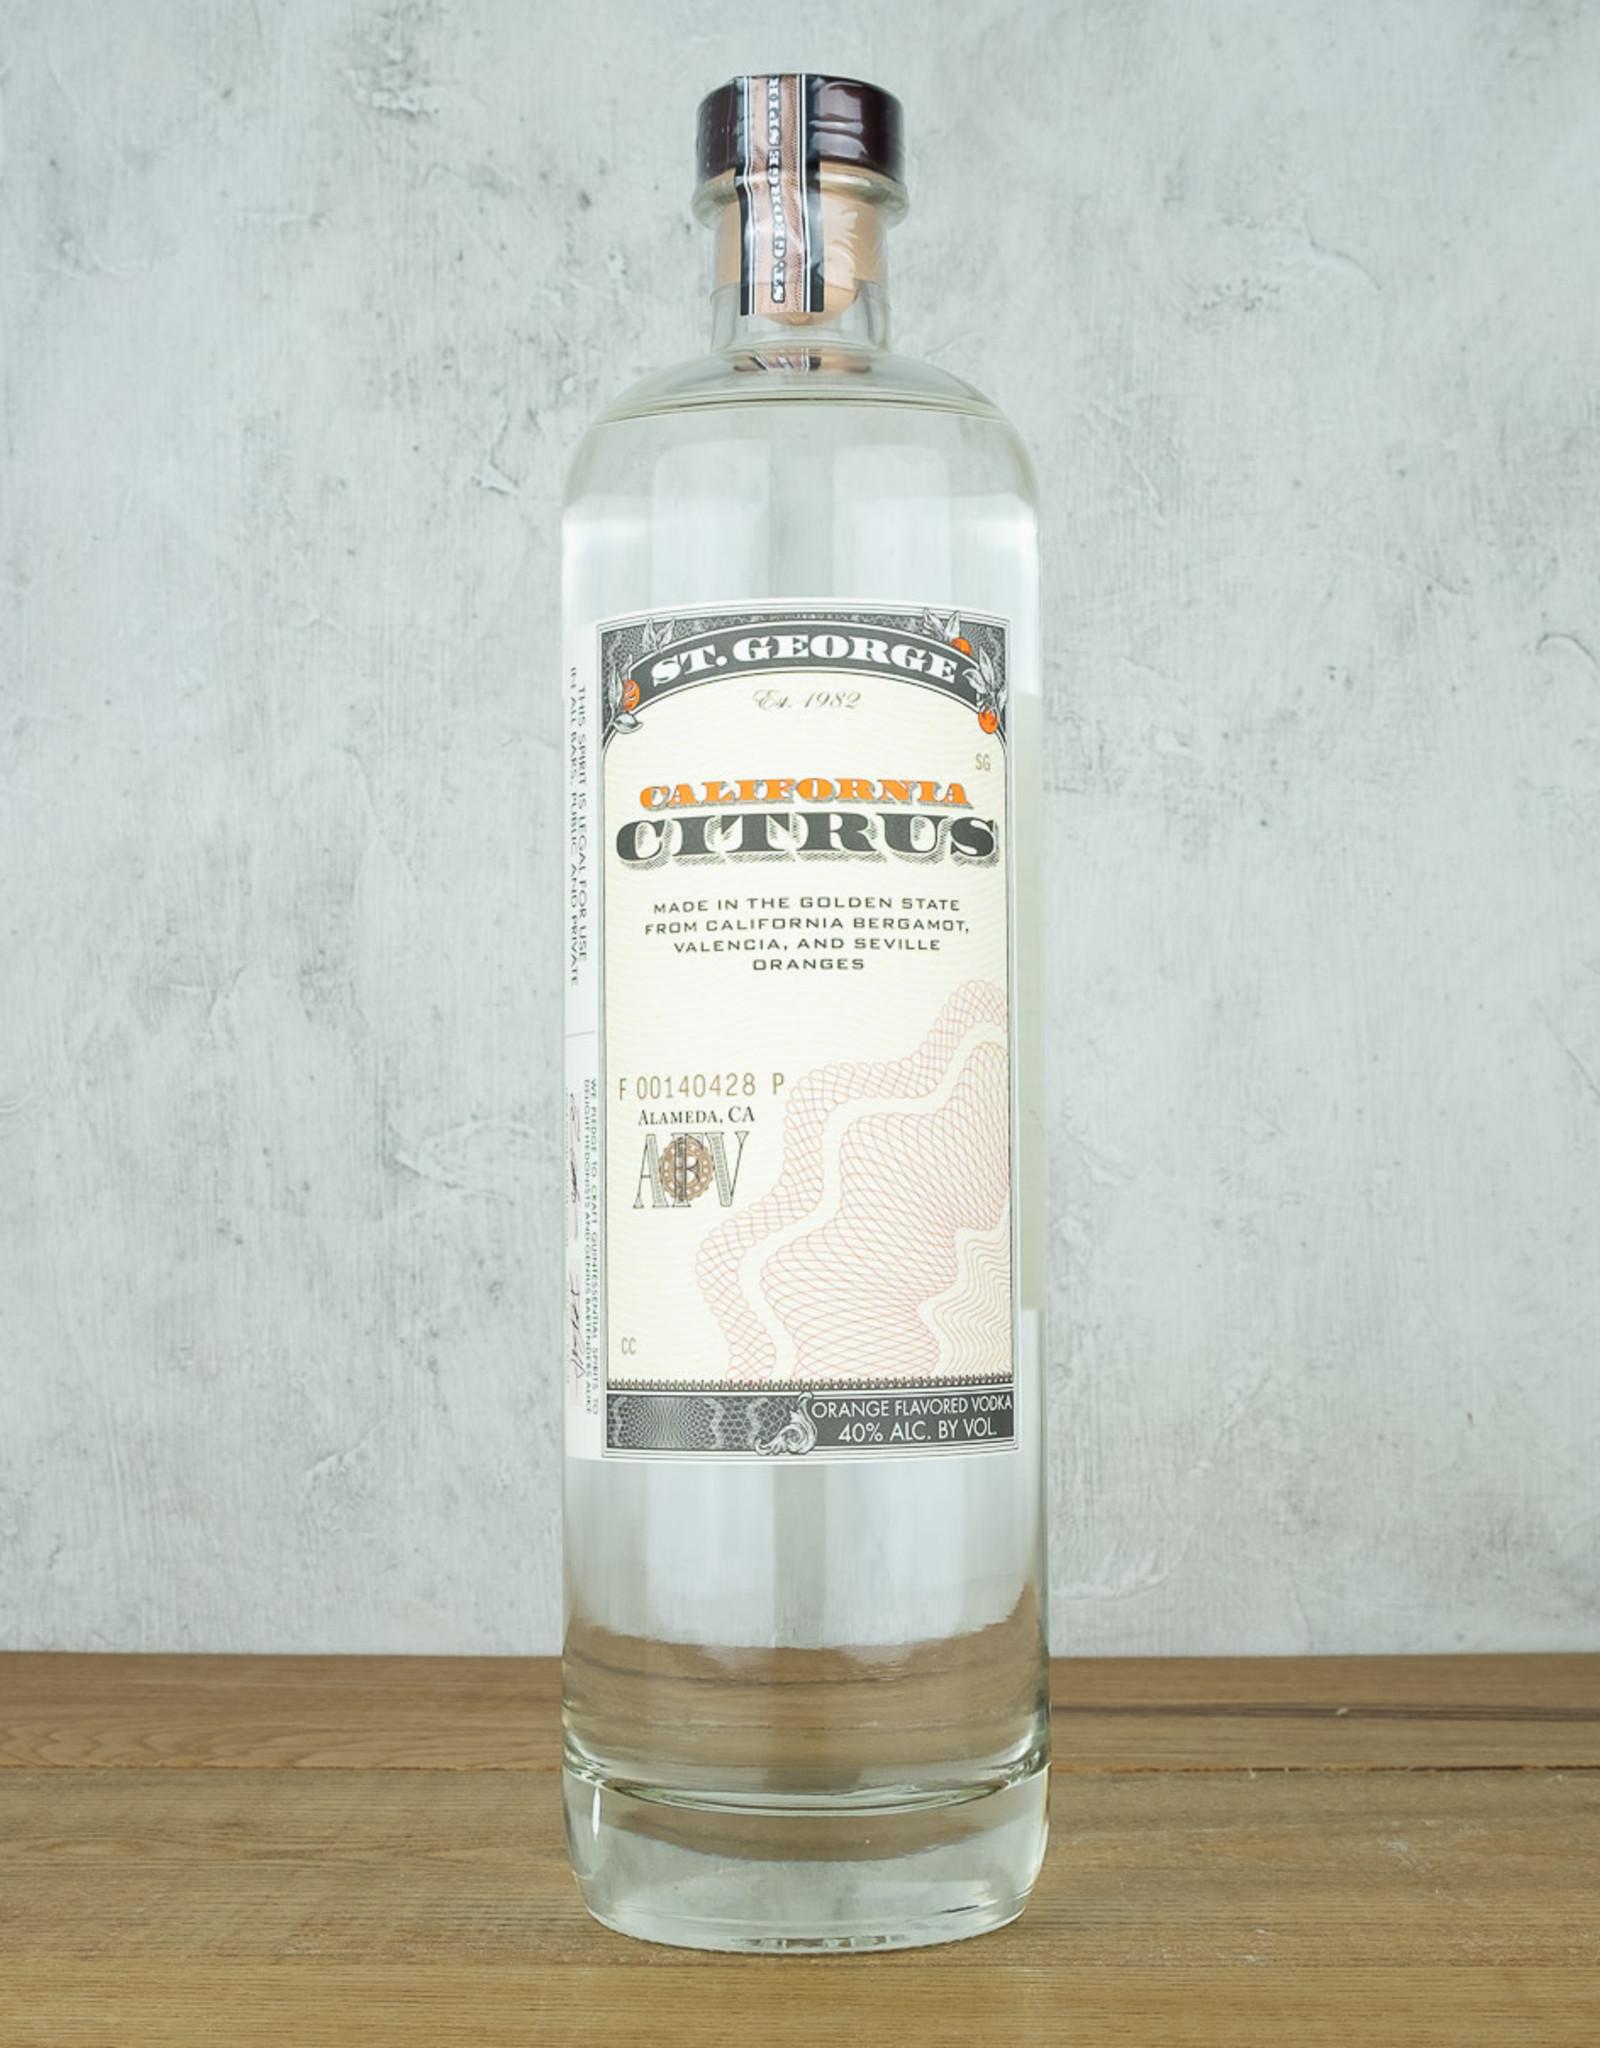 St George Citrus Vodka